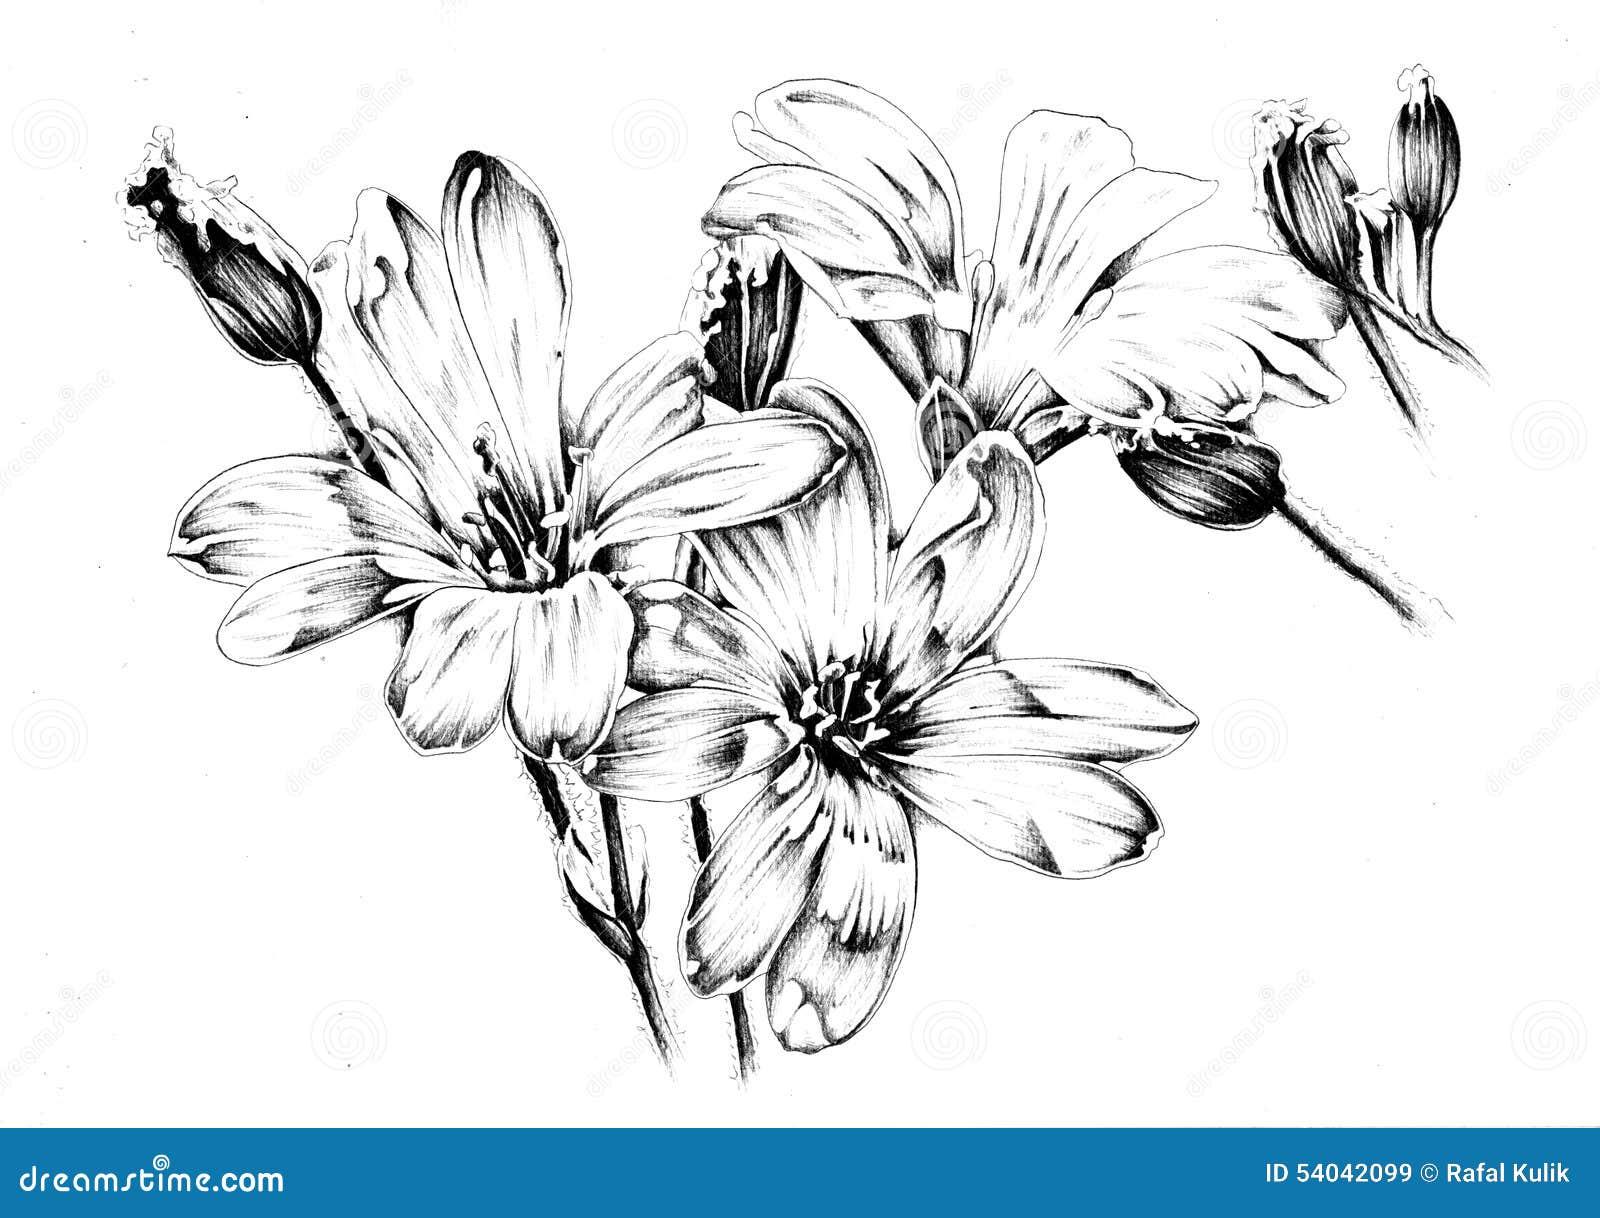 Flower drawing sketch art handmade download preview